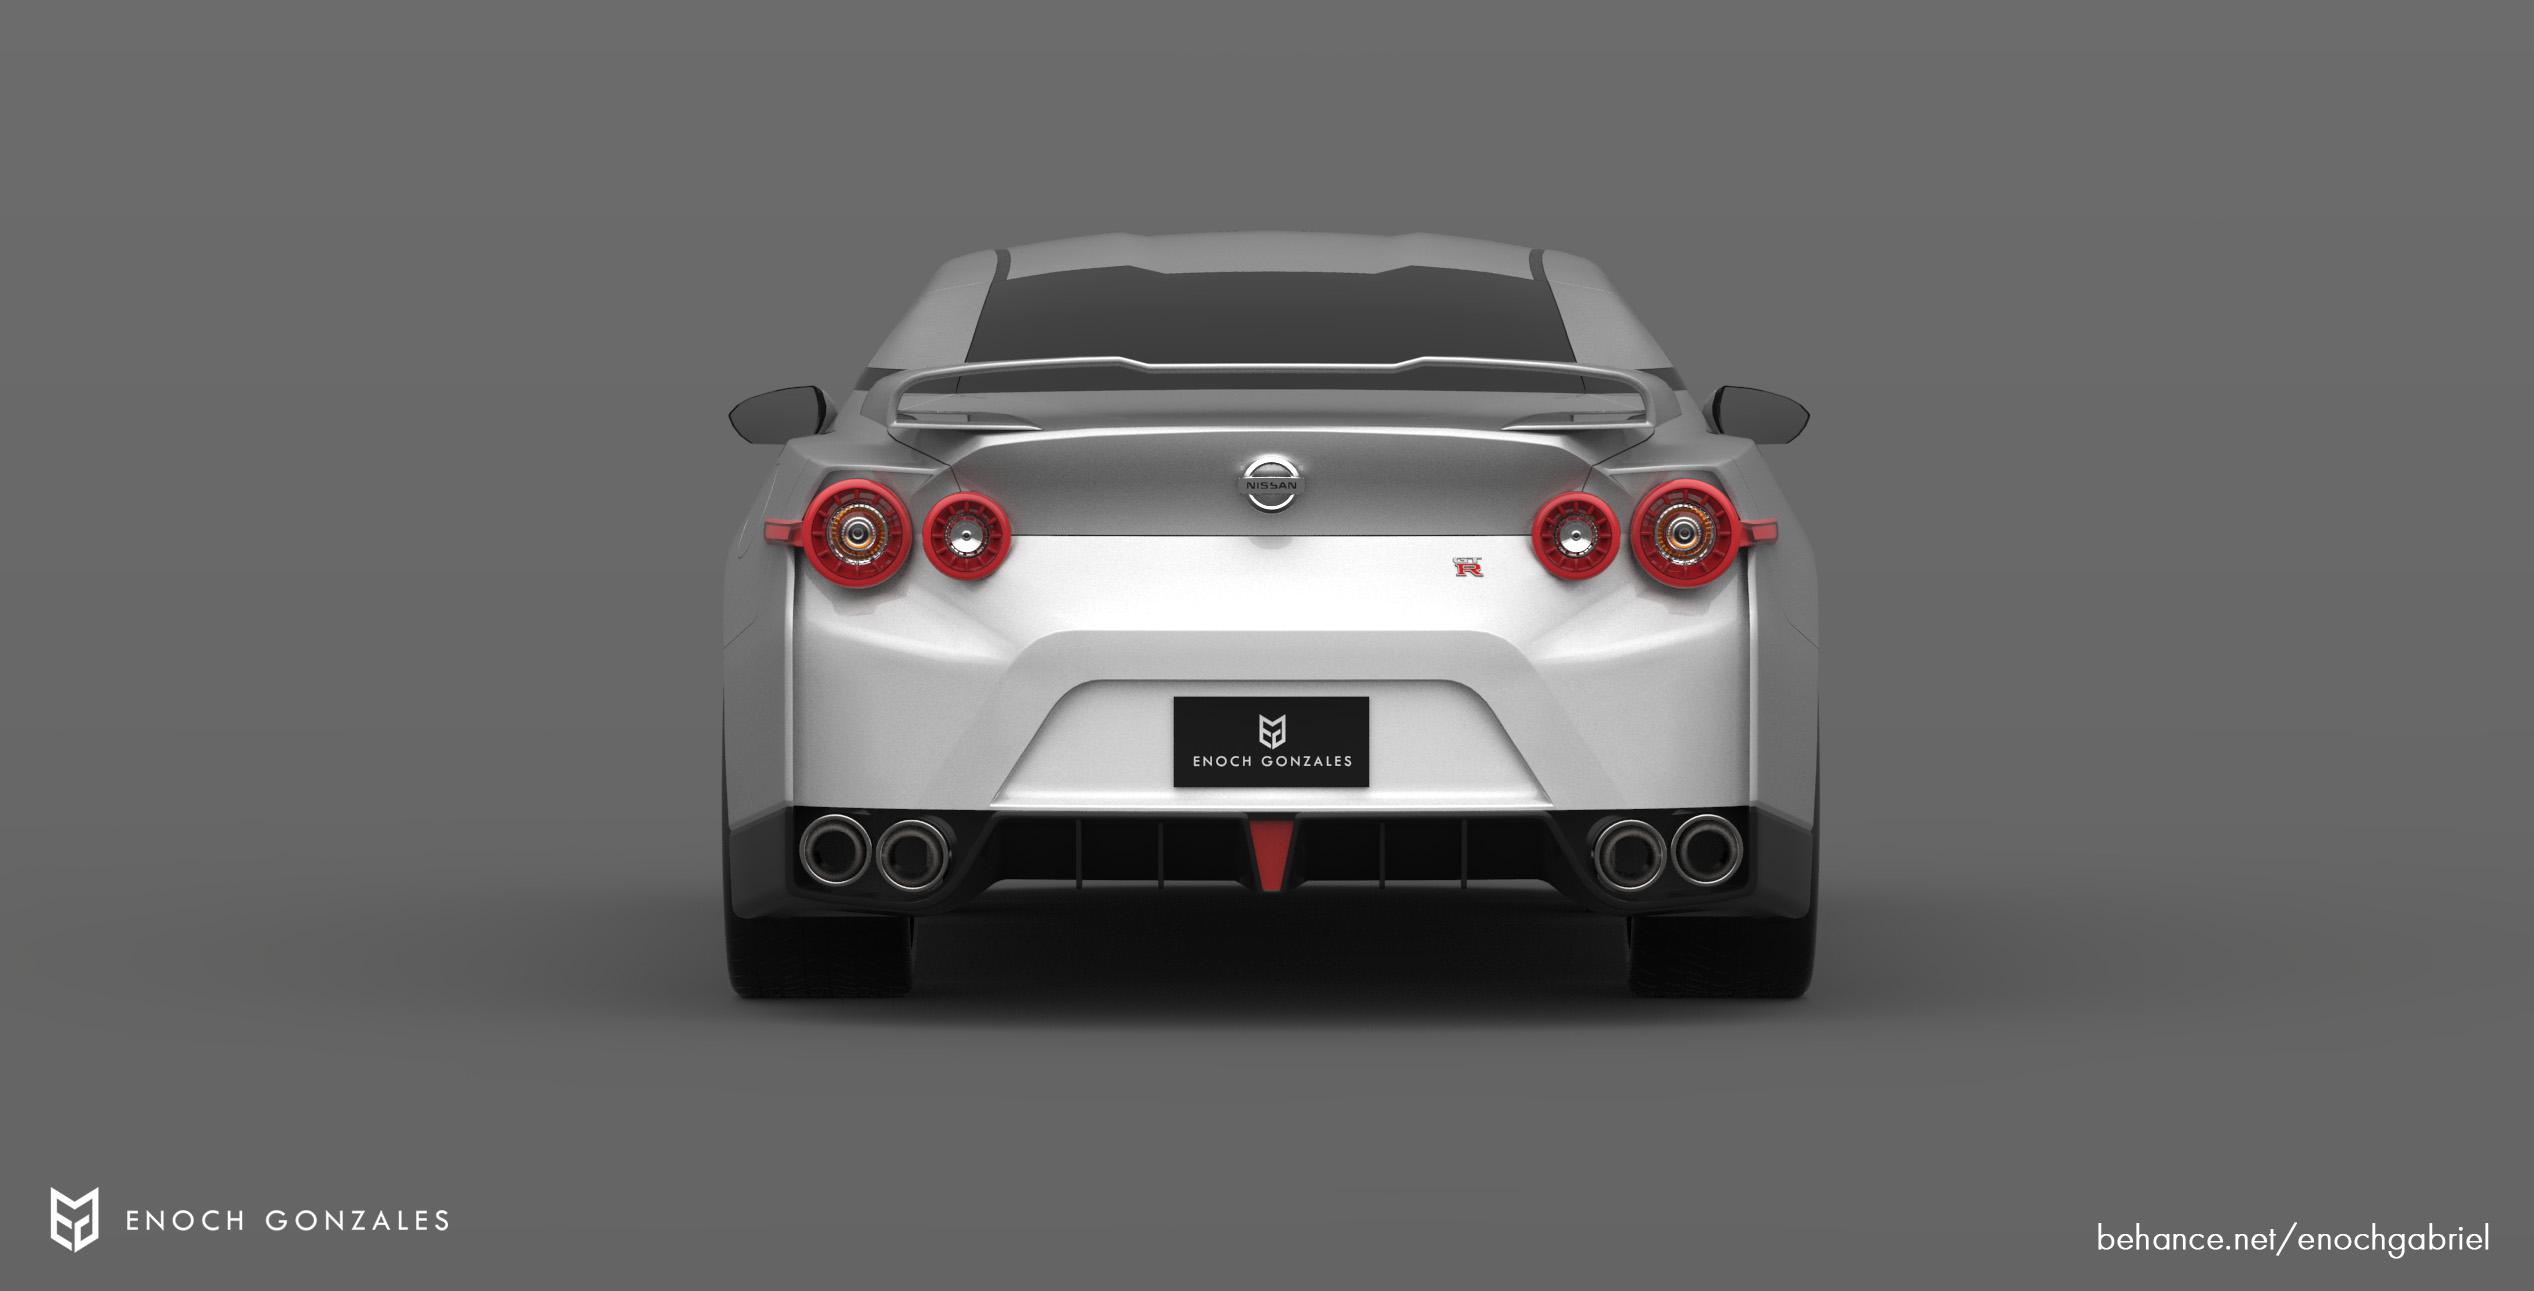 2021 R36 Nissan GT-R rendered, looks sharp | PerformanceDrive